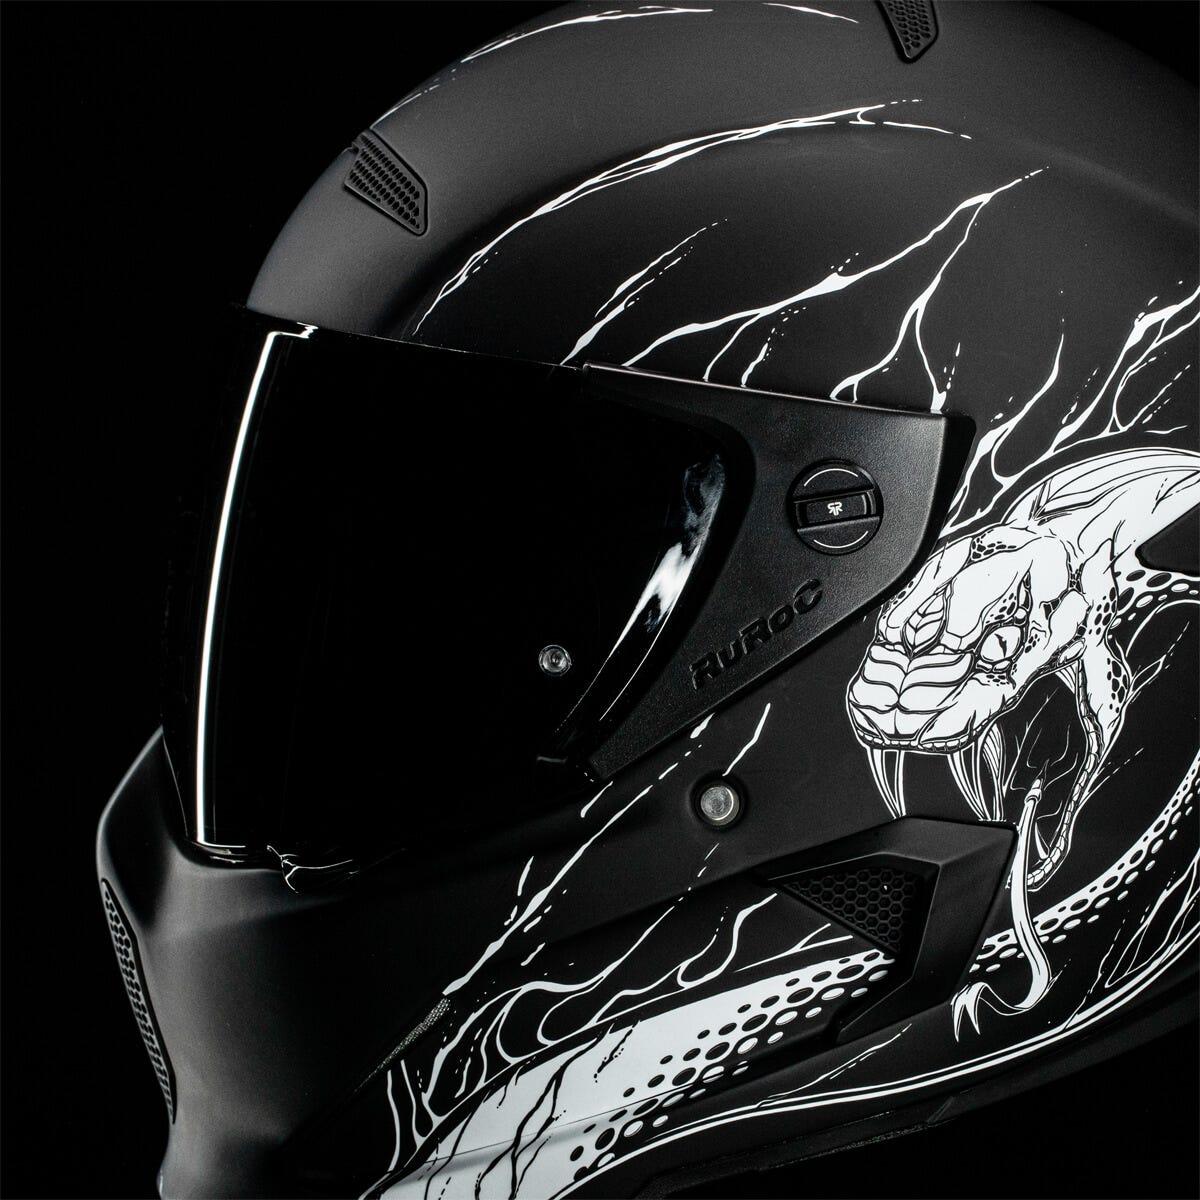 Atlas 2.0 Helmet - Nerve Decay side